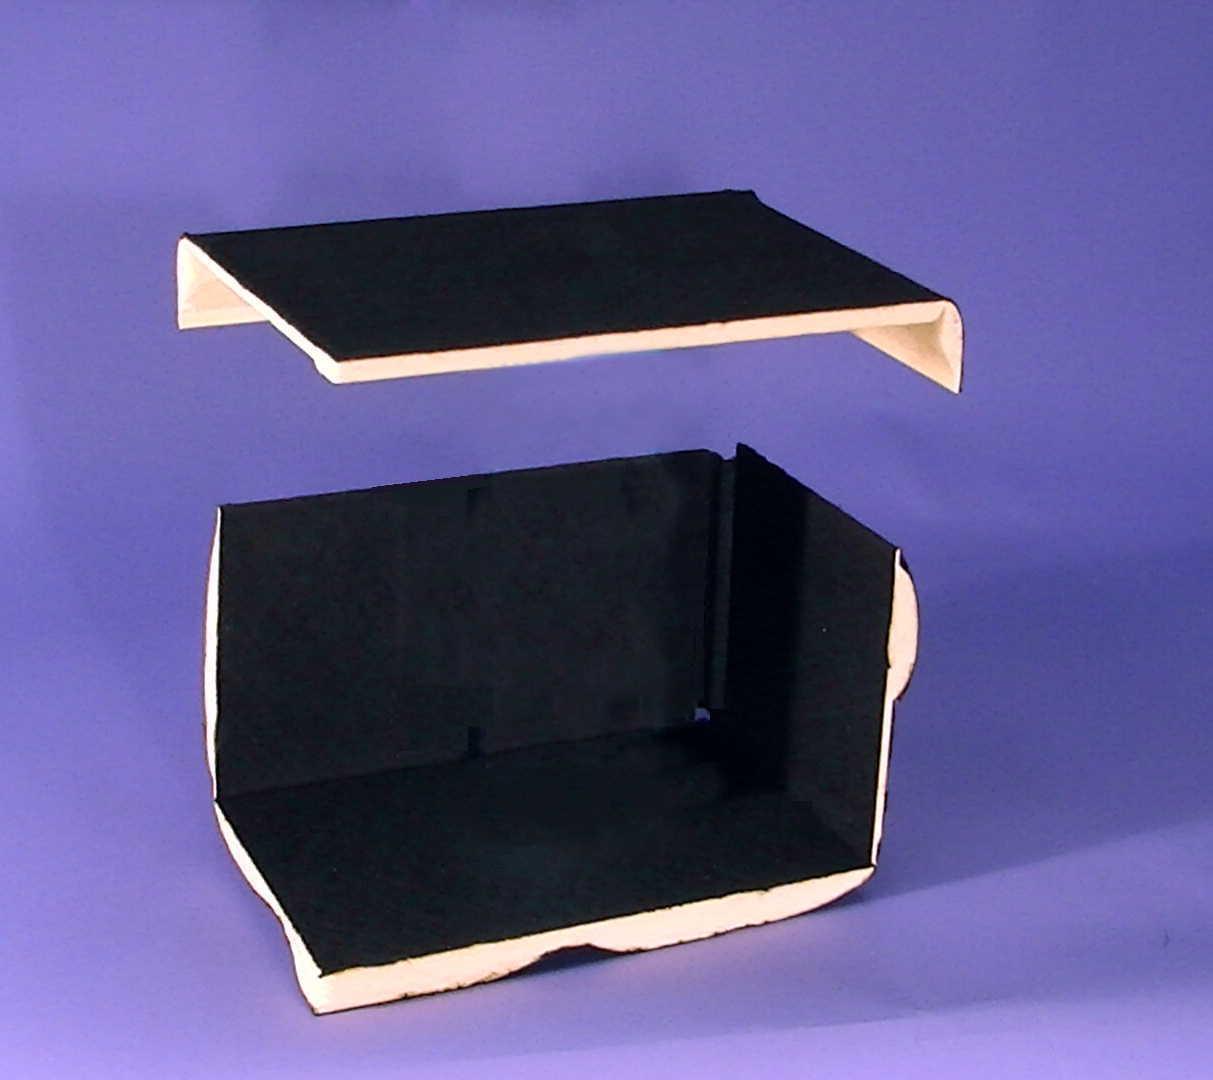 protection thermique des batteries fabrication m canique. Black Bedroom Furniture Sets. Home Design Ideas